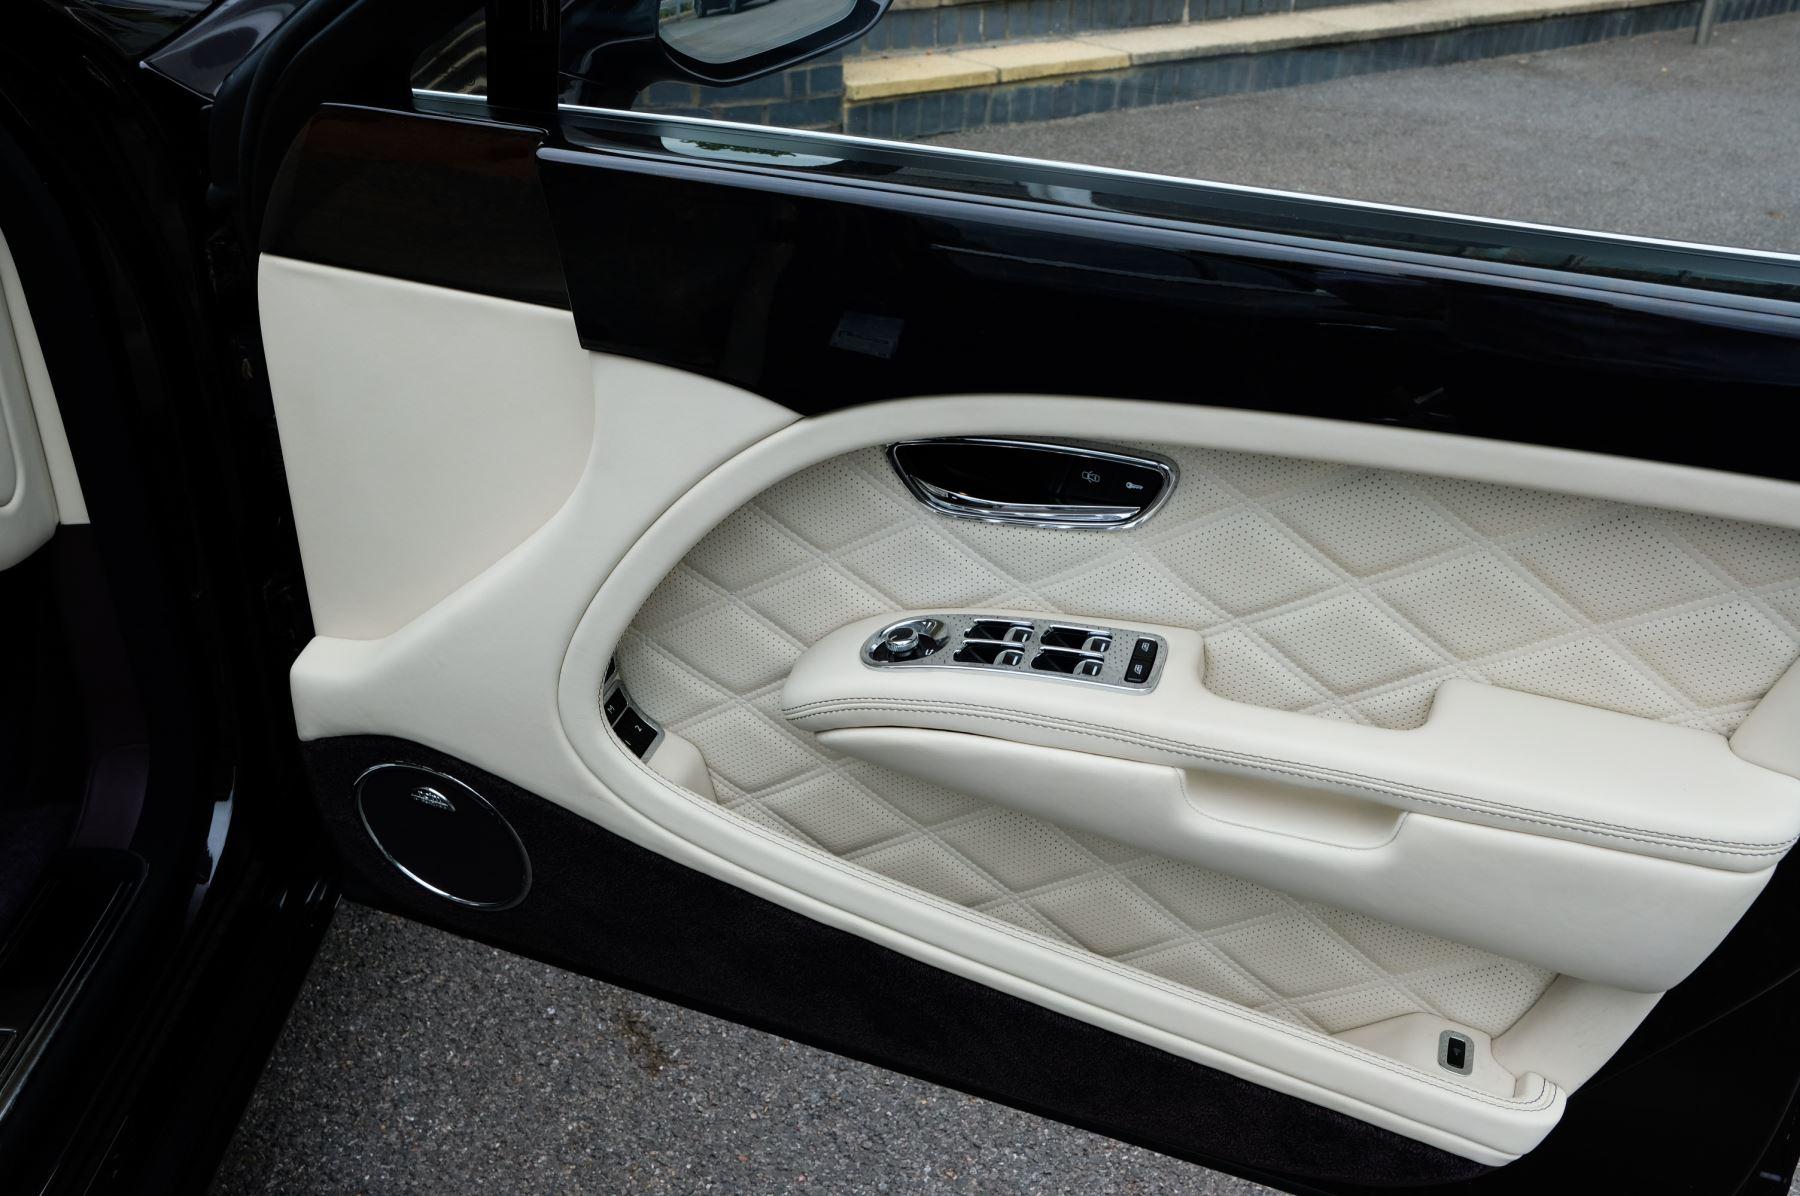 Bentley Mulsanne 6.8 V8 Speed - Speed Premier Specification image 16